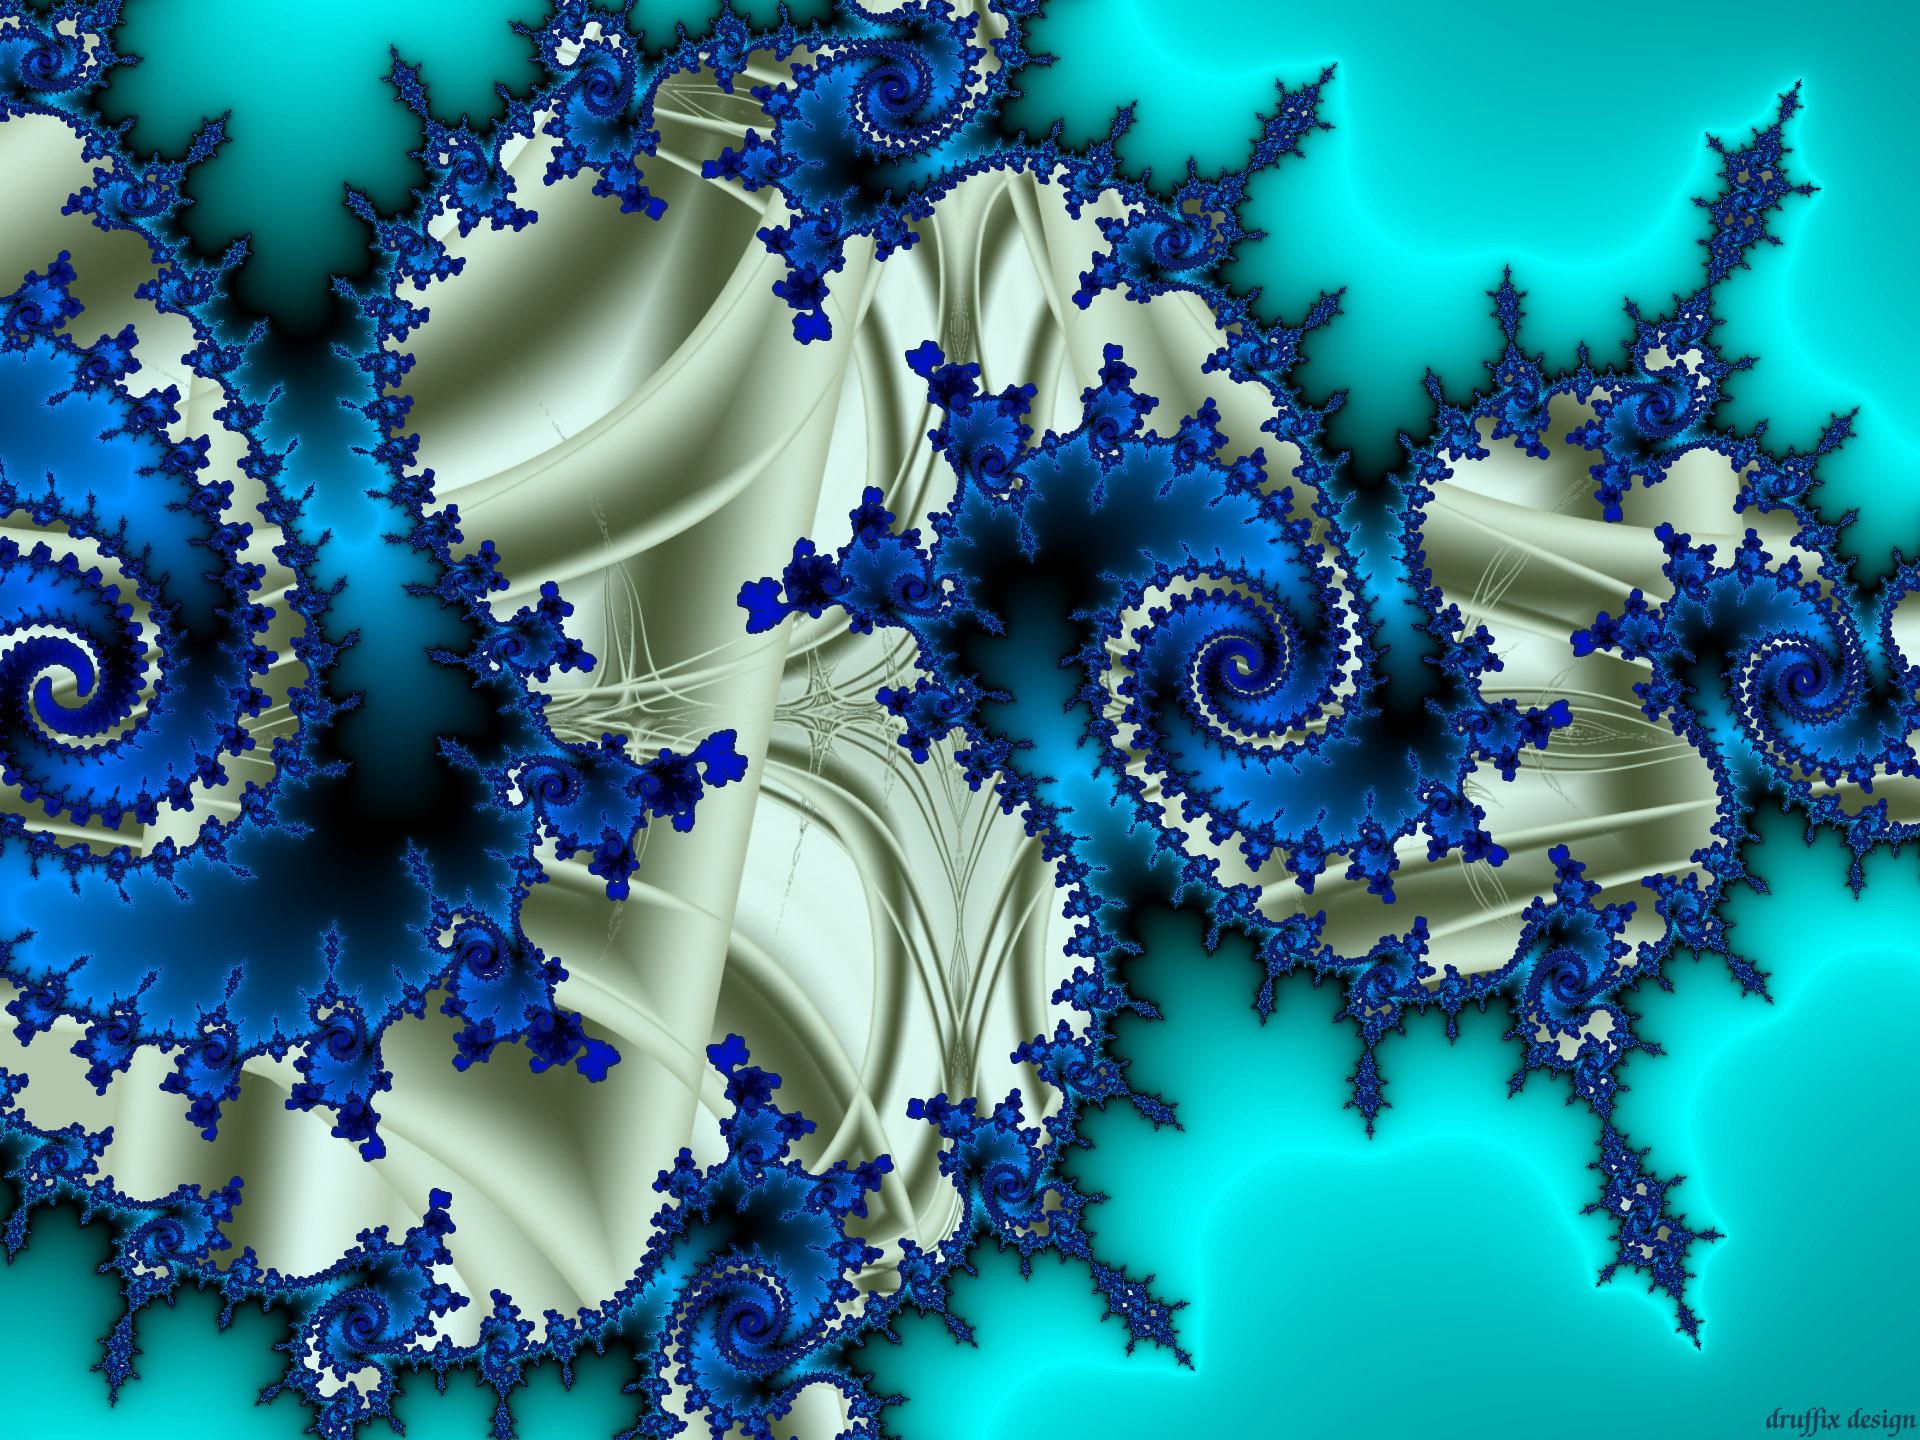 Full hd 3d wallpaper fractal wallpapersafari for 3d wallpaper hd for home wall